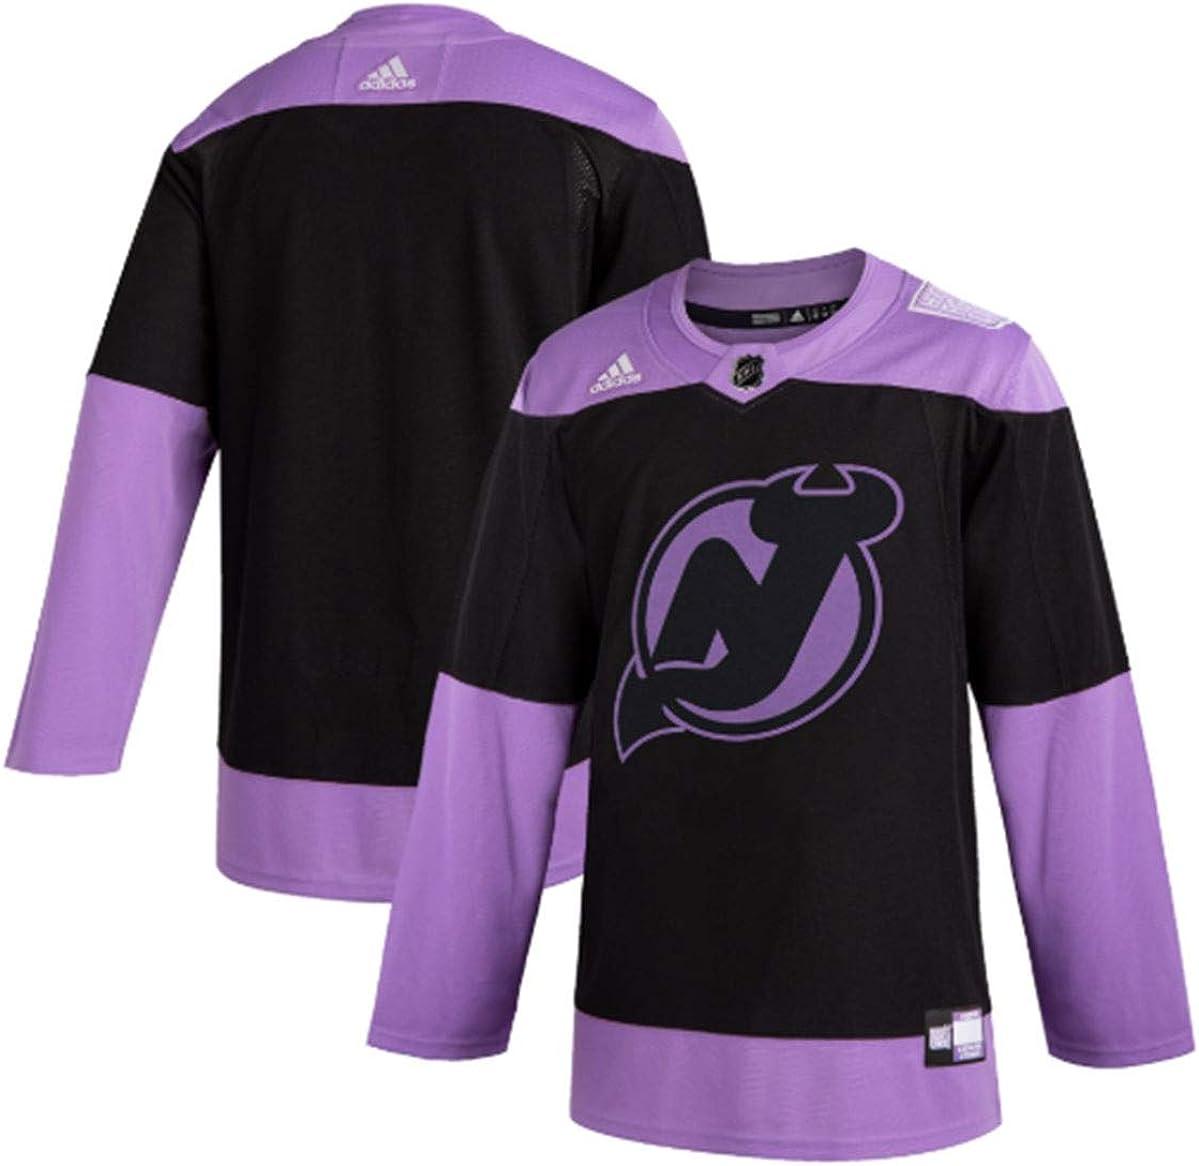 Amazon.com : adidas New Jersey Devils Men's Black/Purple Hockey ...